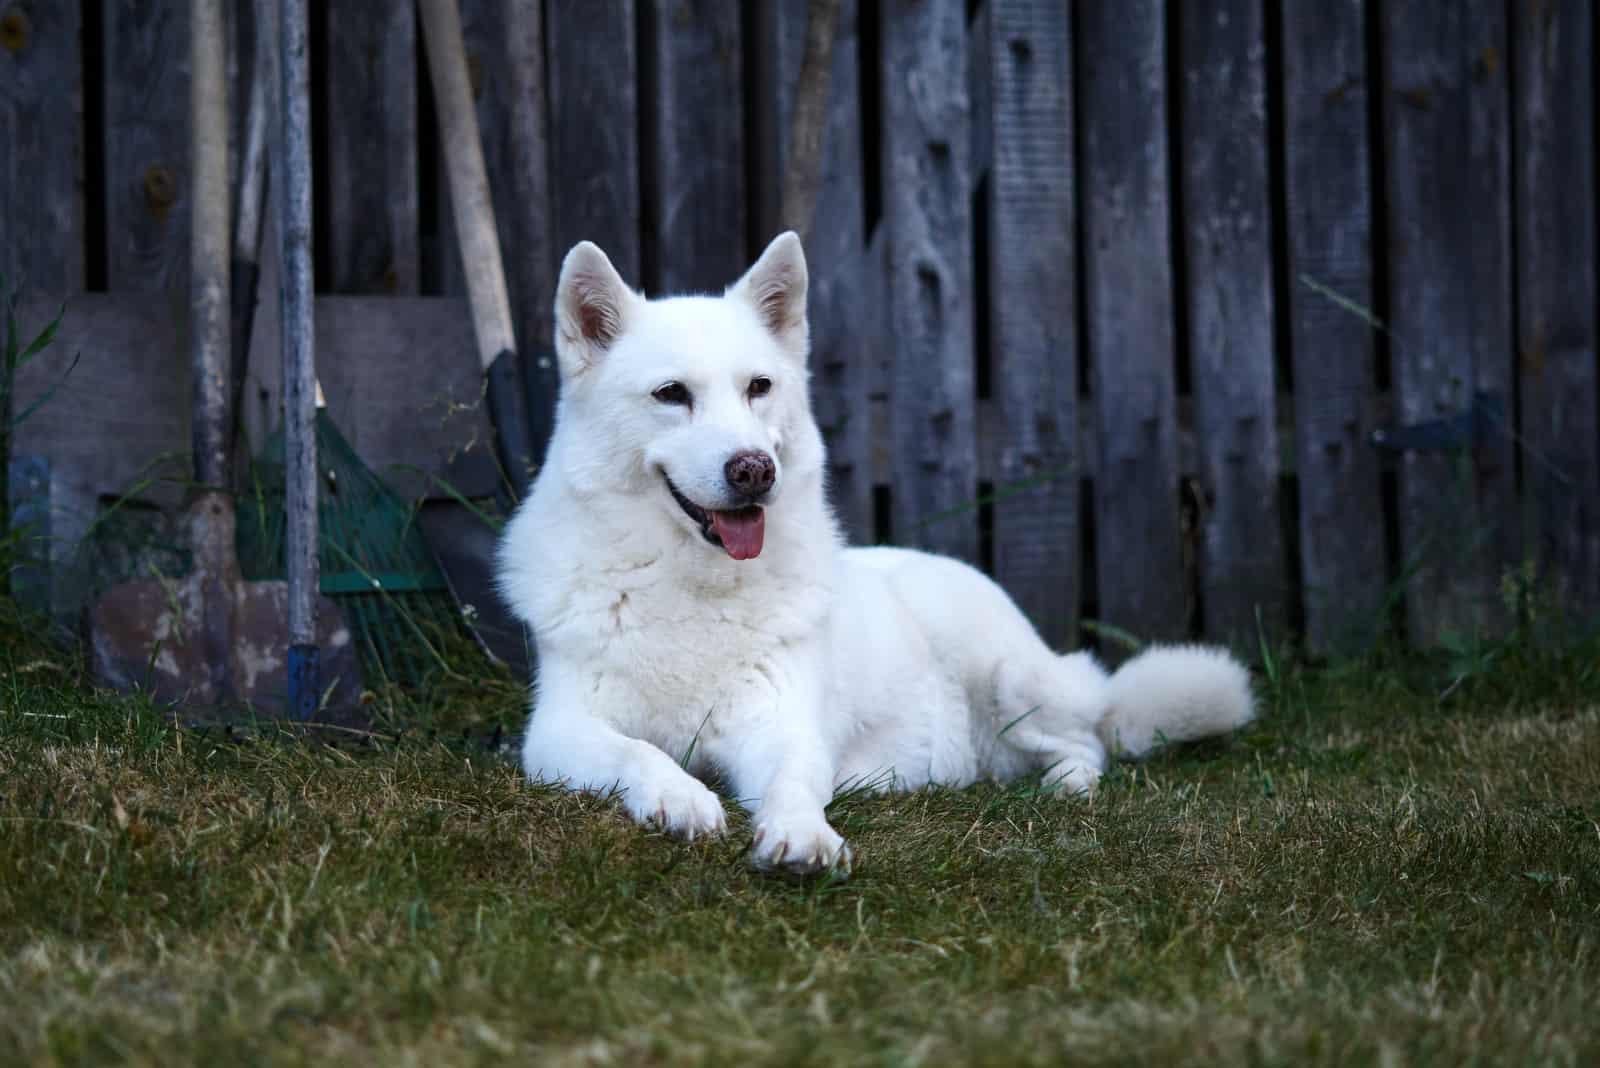 white husky dog sits and looks around